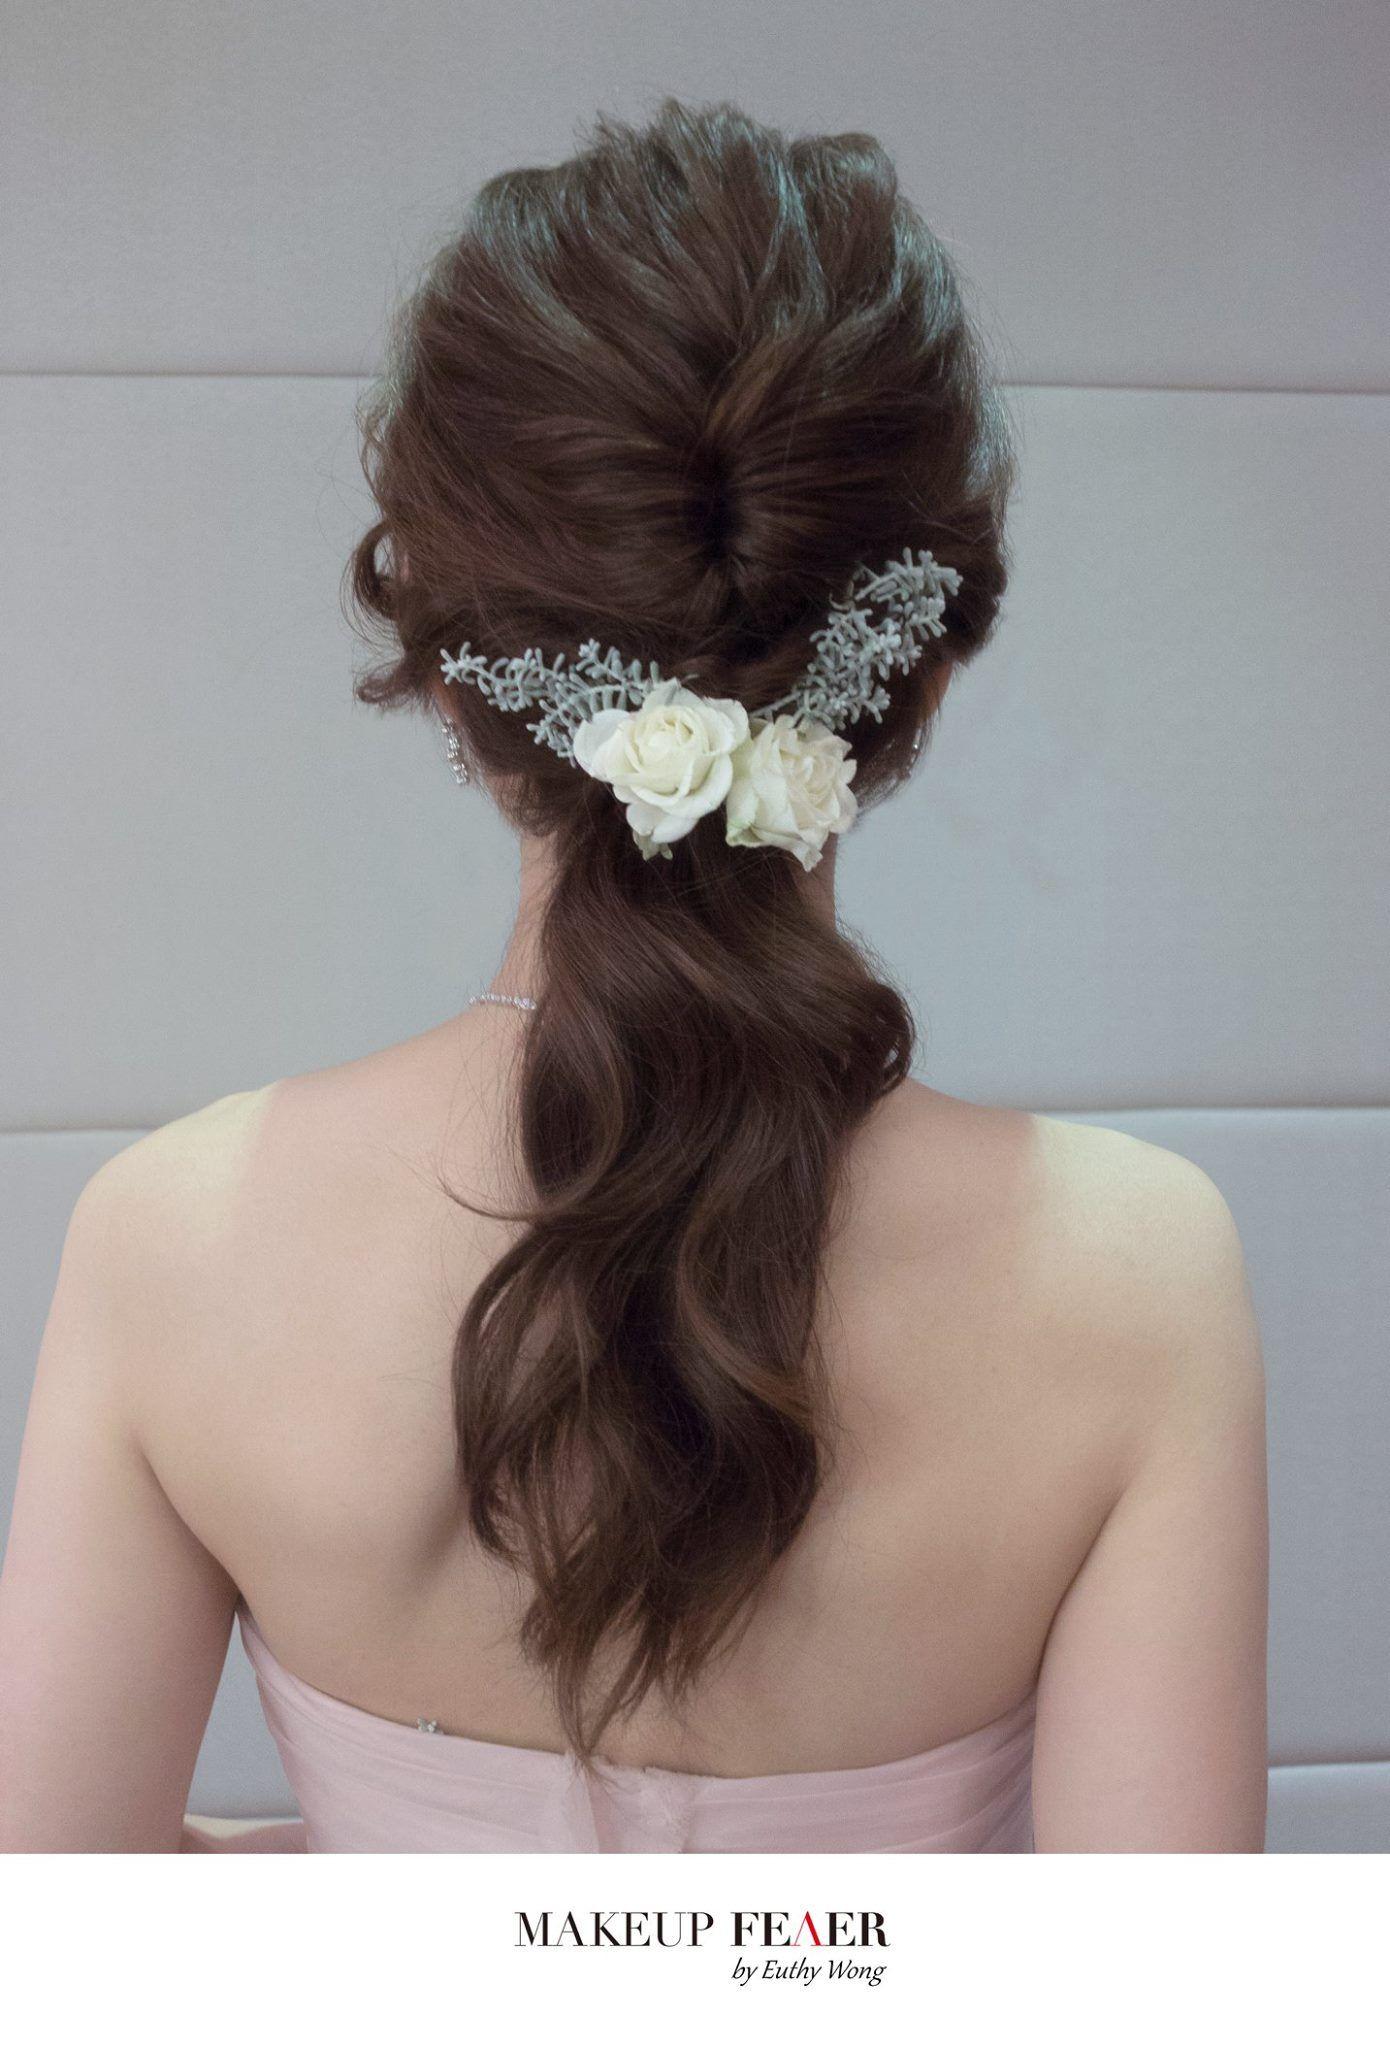 out job 2 ‹ 新娘化妝服務|bridal makeup|新娘化妝師|化妝服務|新娘化妝